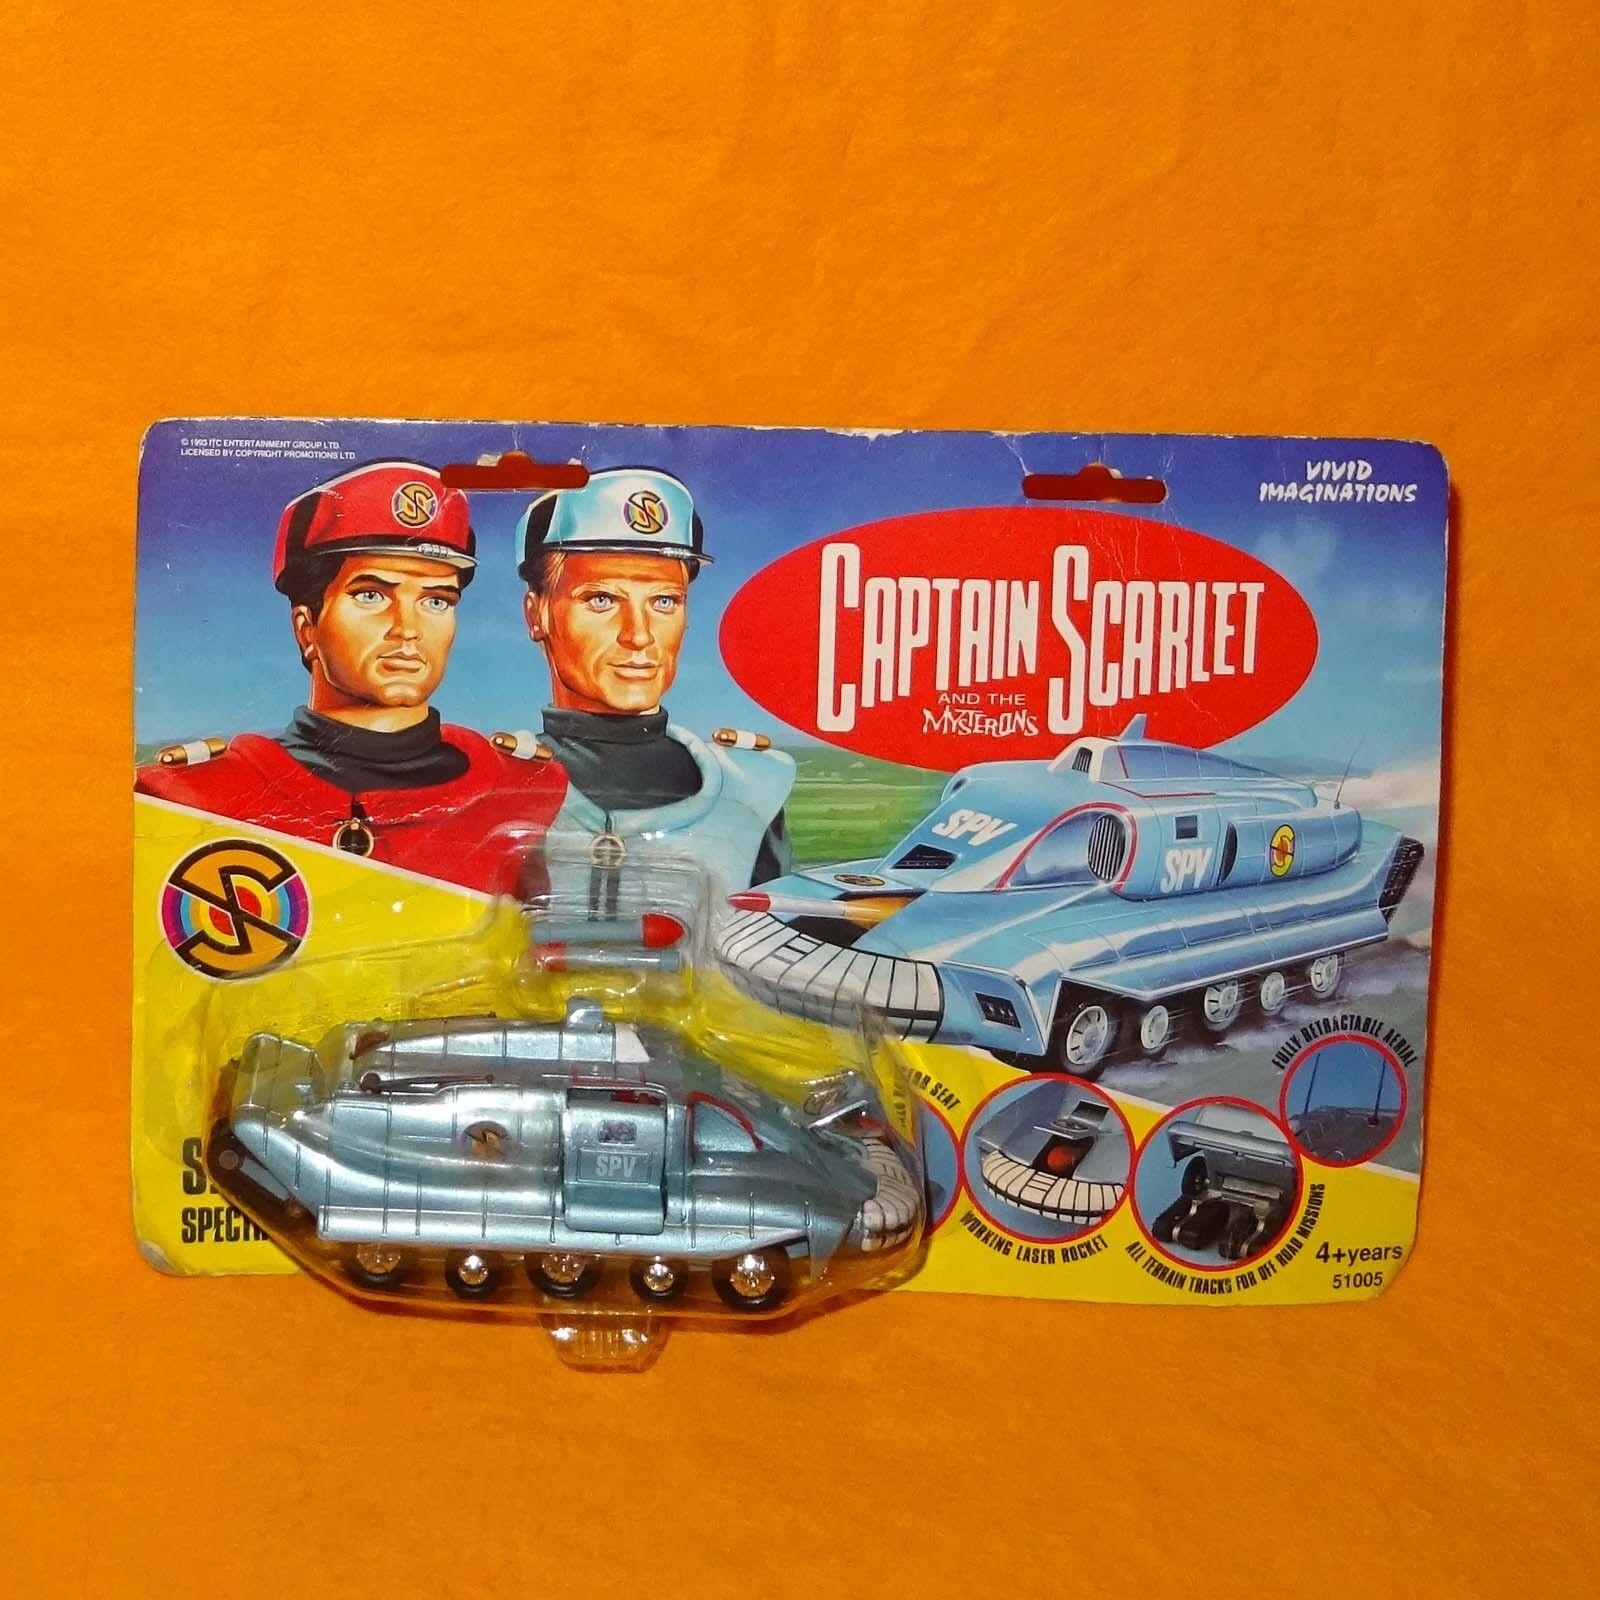 Vivid Imaginations 1993 Captain Scarlet SPV spettro Inseguimento Veicolo MOC cardate